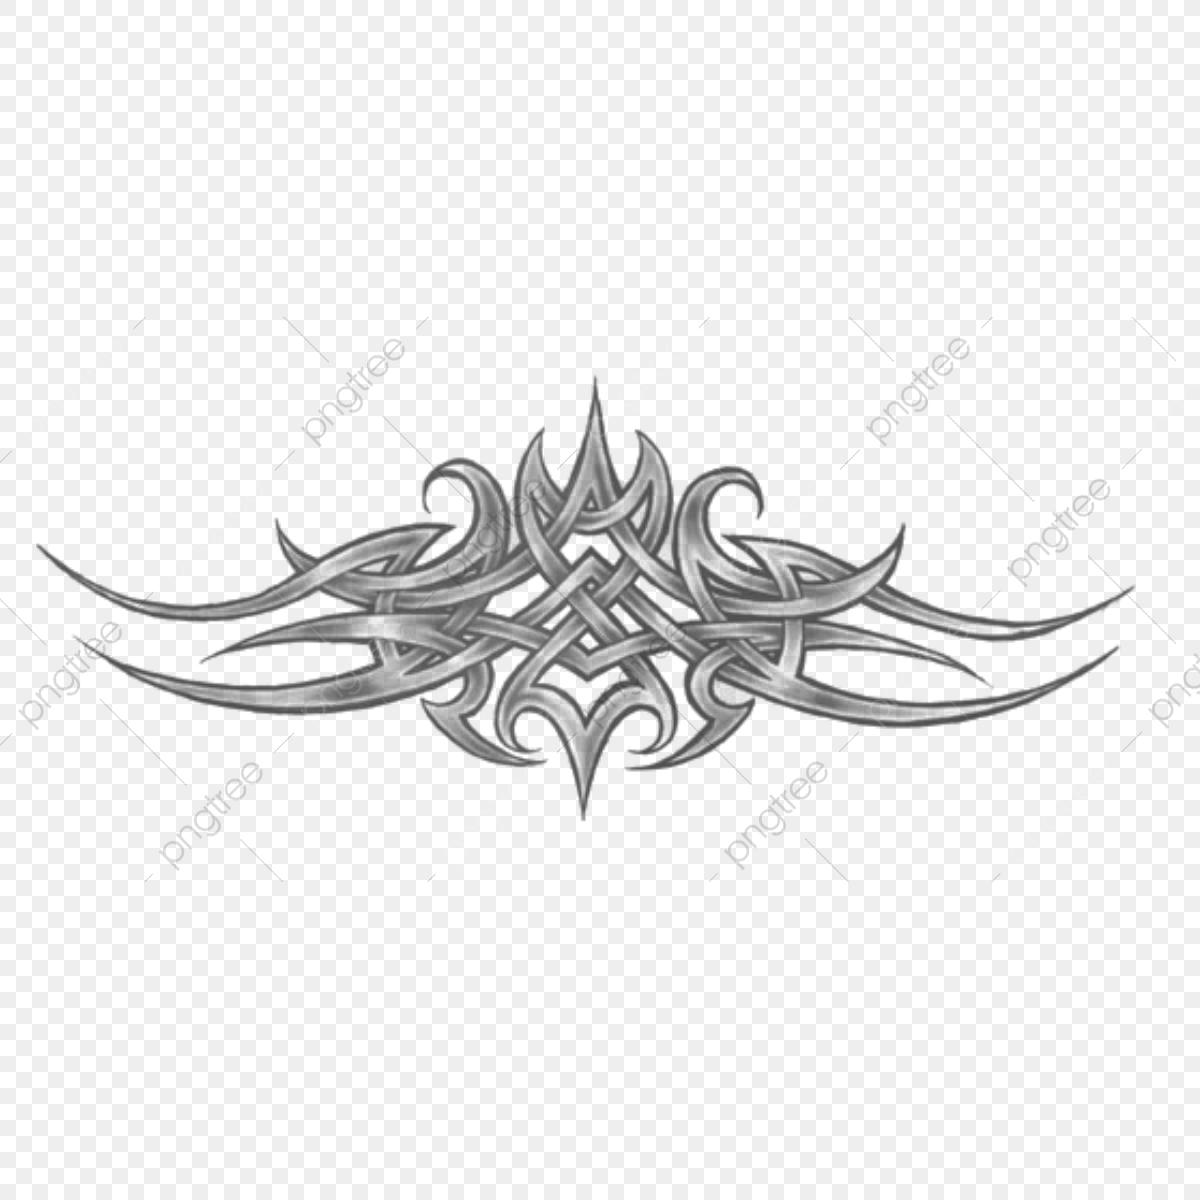 Free Tattoos Designs Simple Latest, Small Tattoos Designs.